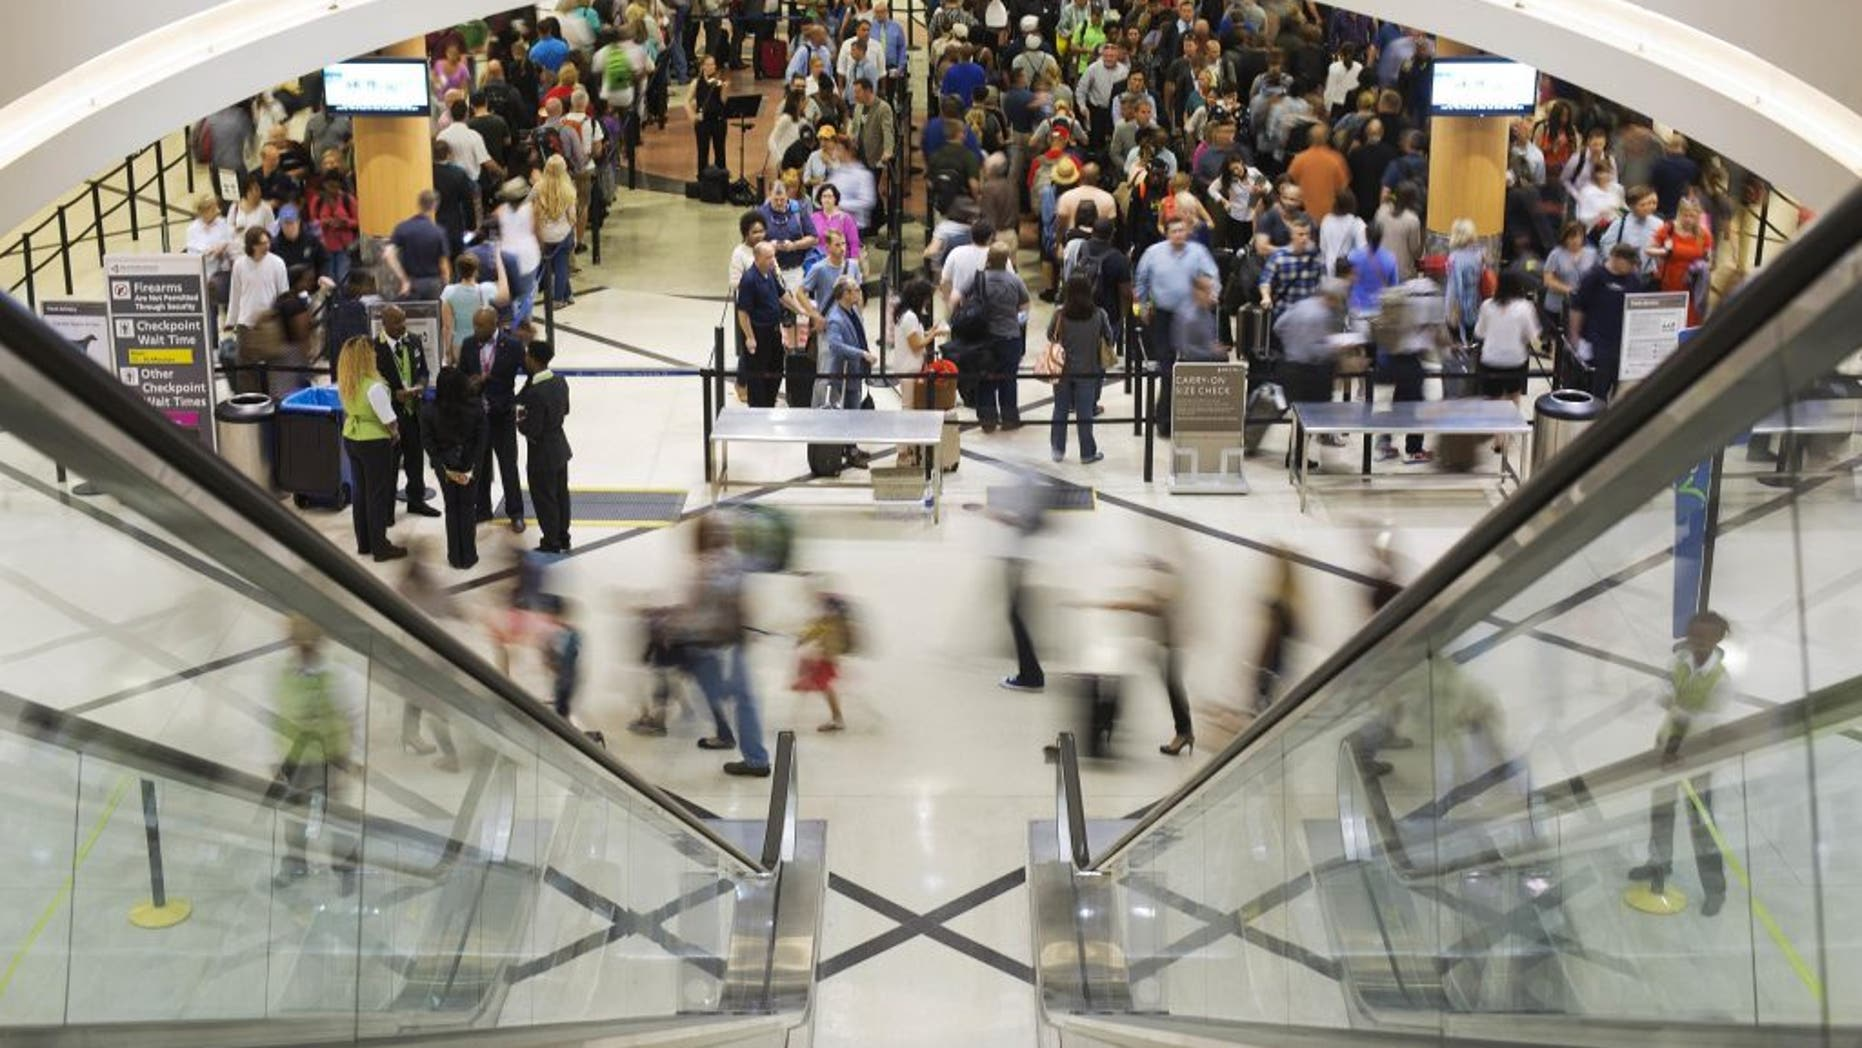 Airline travelers move through a TSA line at Atlanta's Hartsfield-Jackson International Airport.